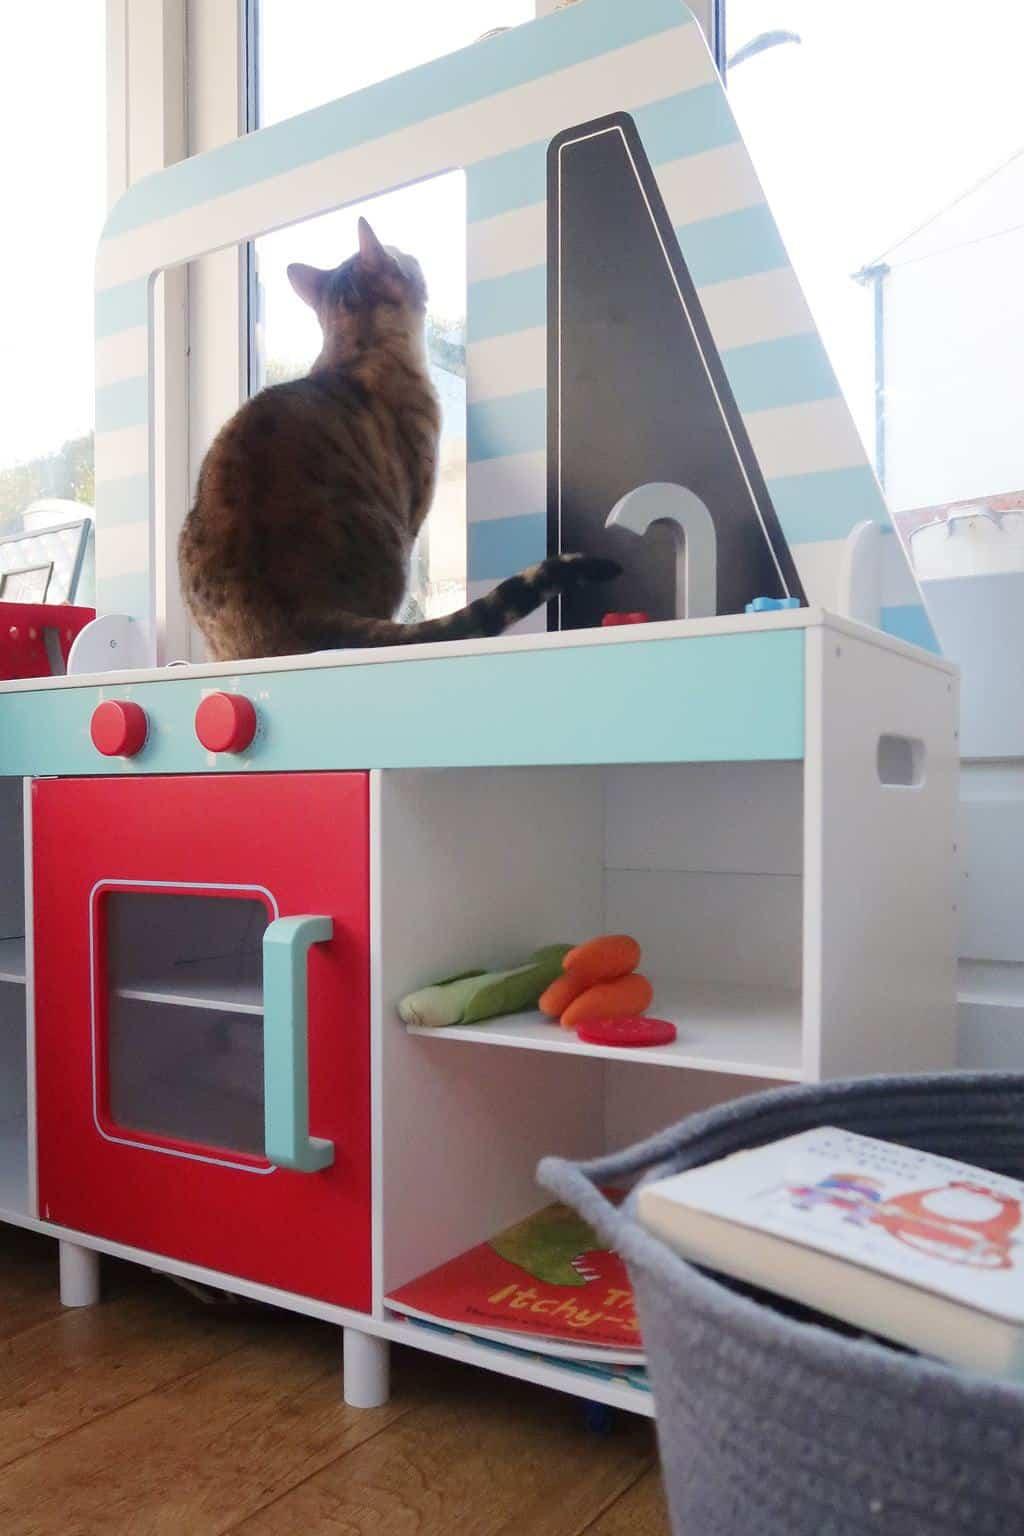 Seren in her favourite spot on the GLTC Festival Food Van